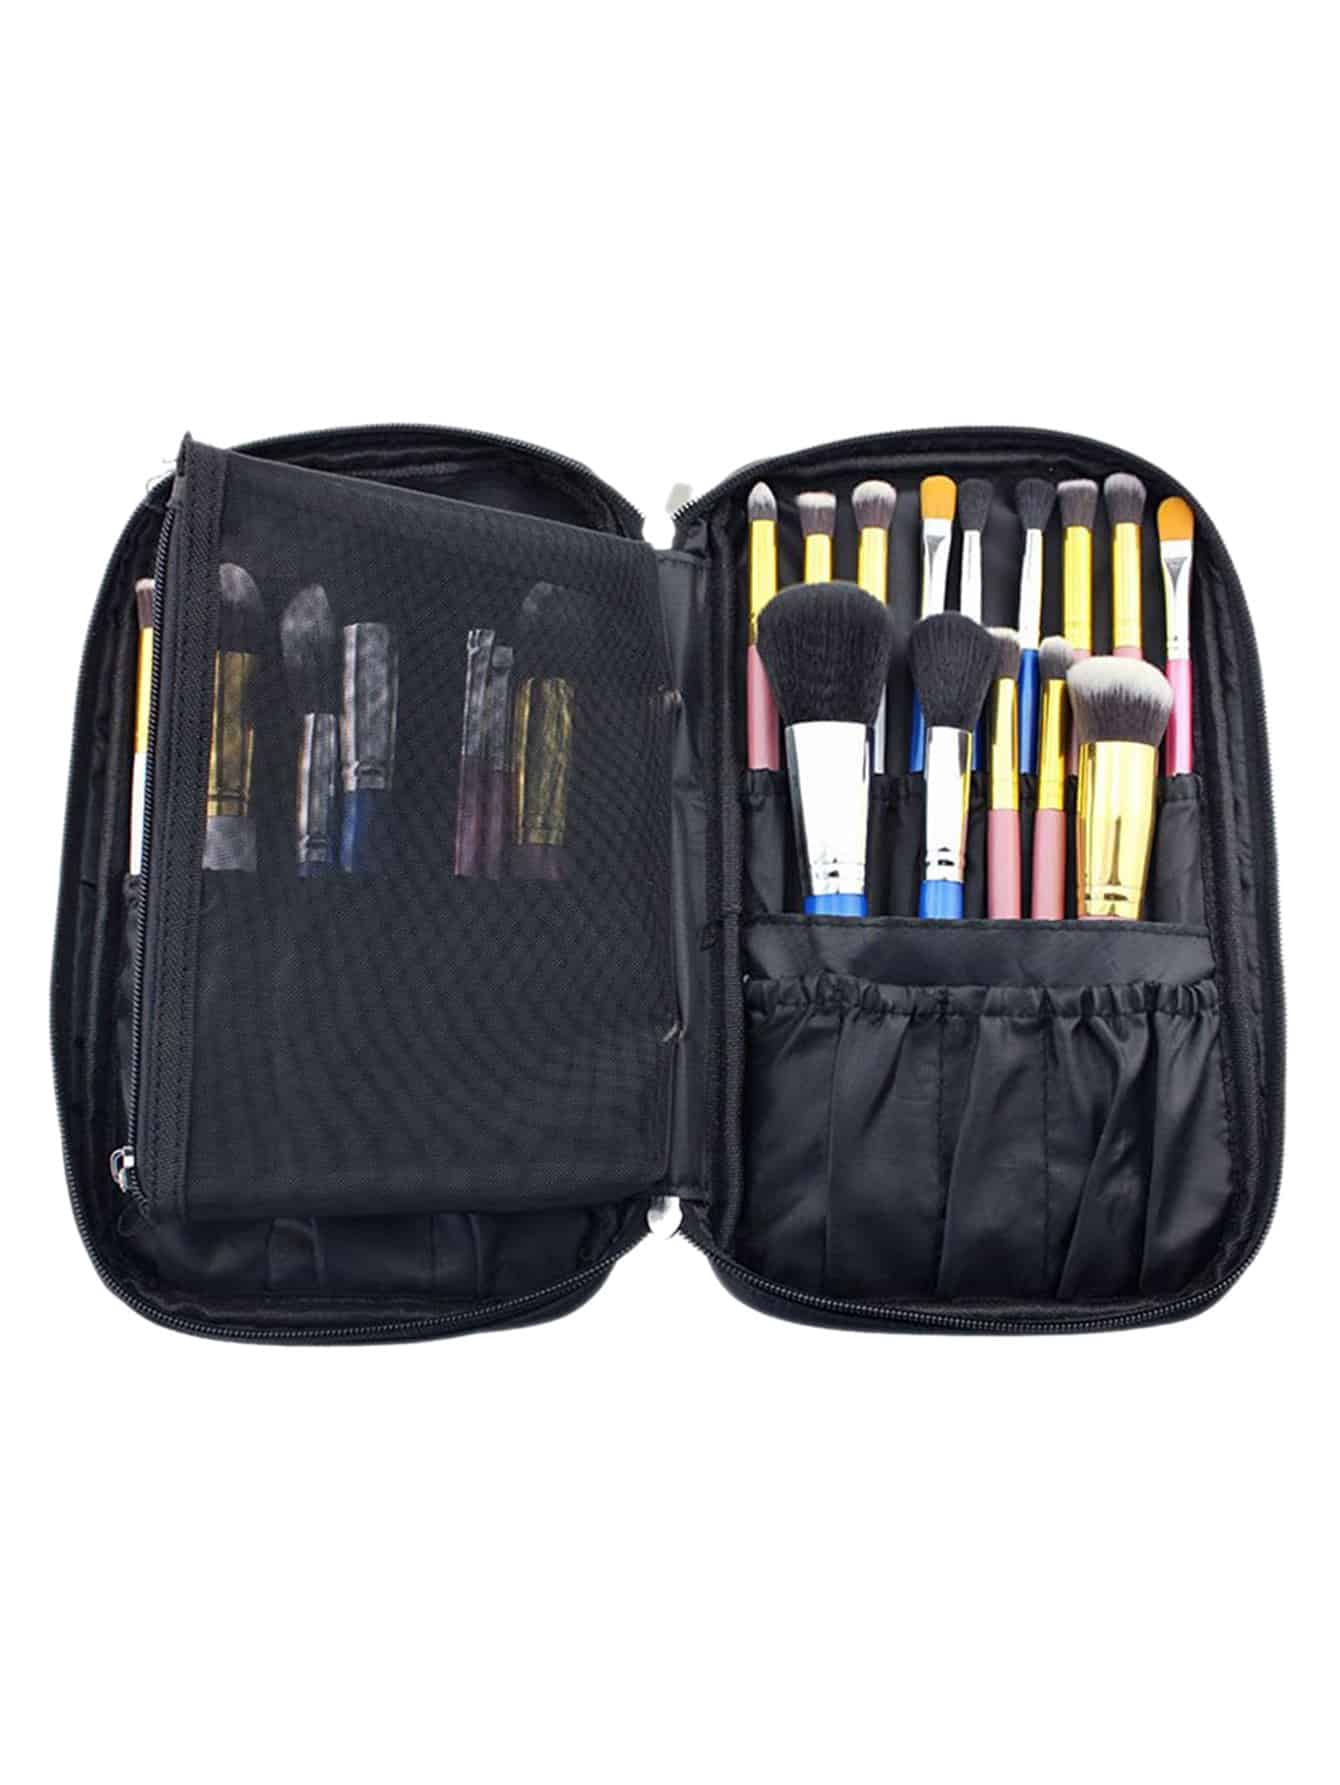 Black Zipper Makeup Bag With Small Mesh Bag